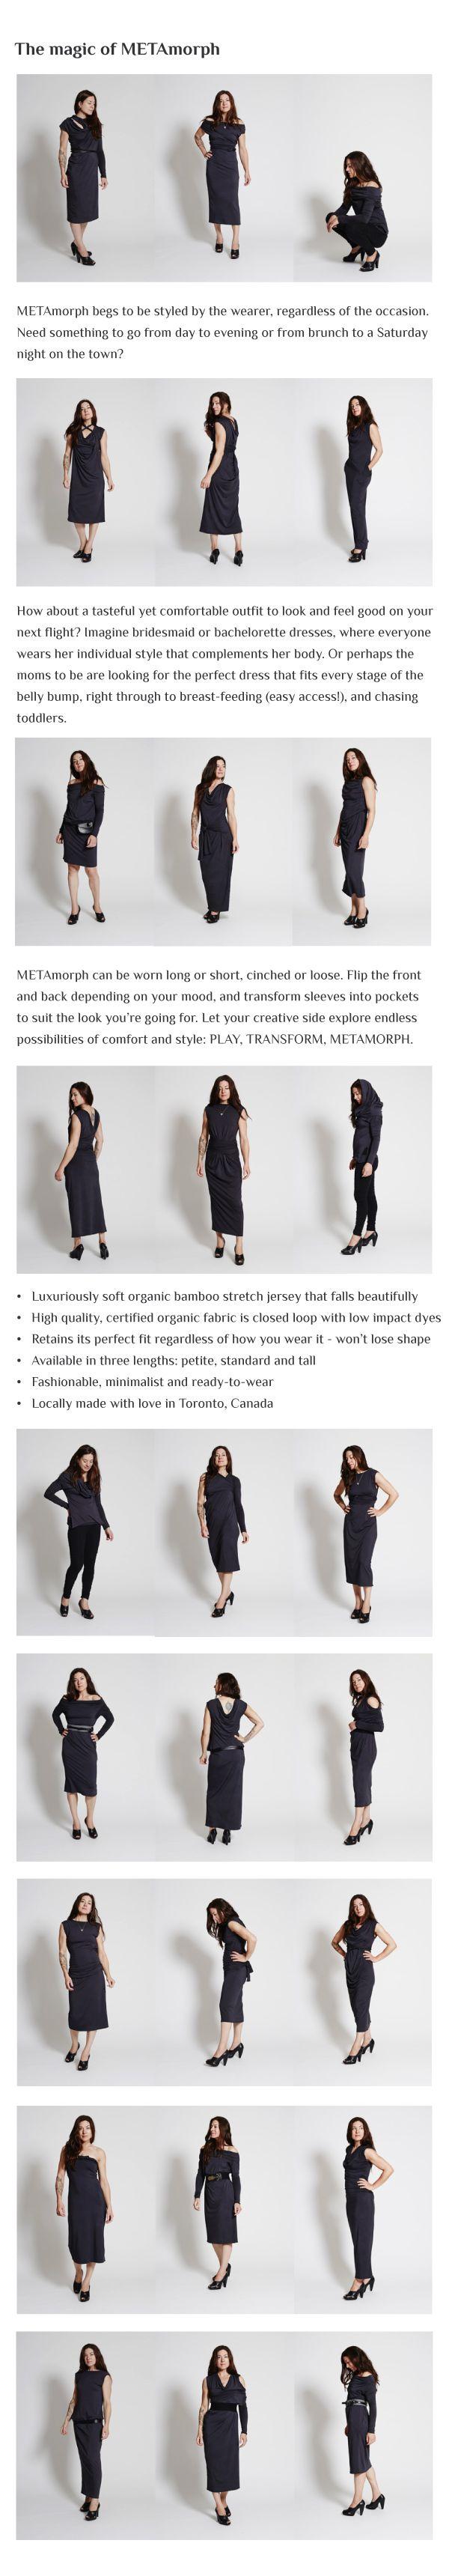 24 styles of Metamorph Dress http//www.thievesboutique